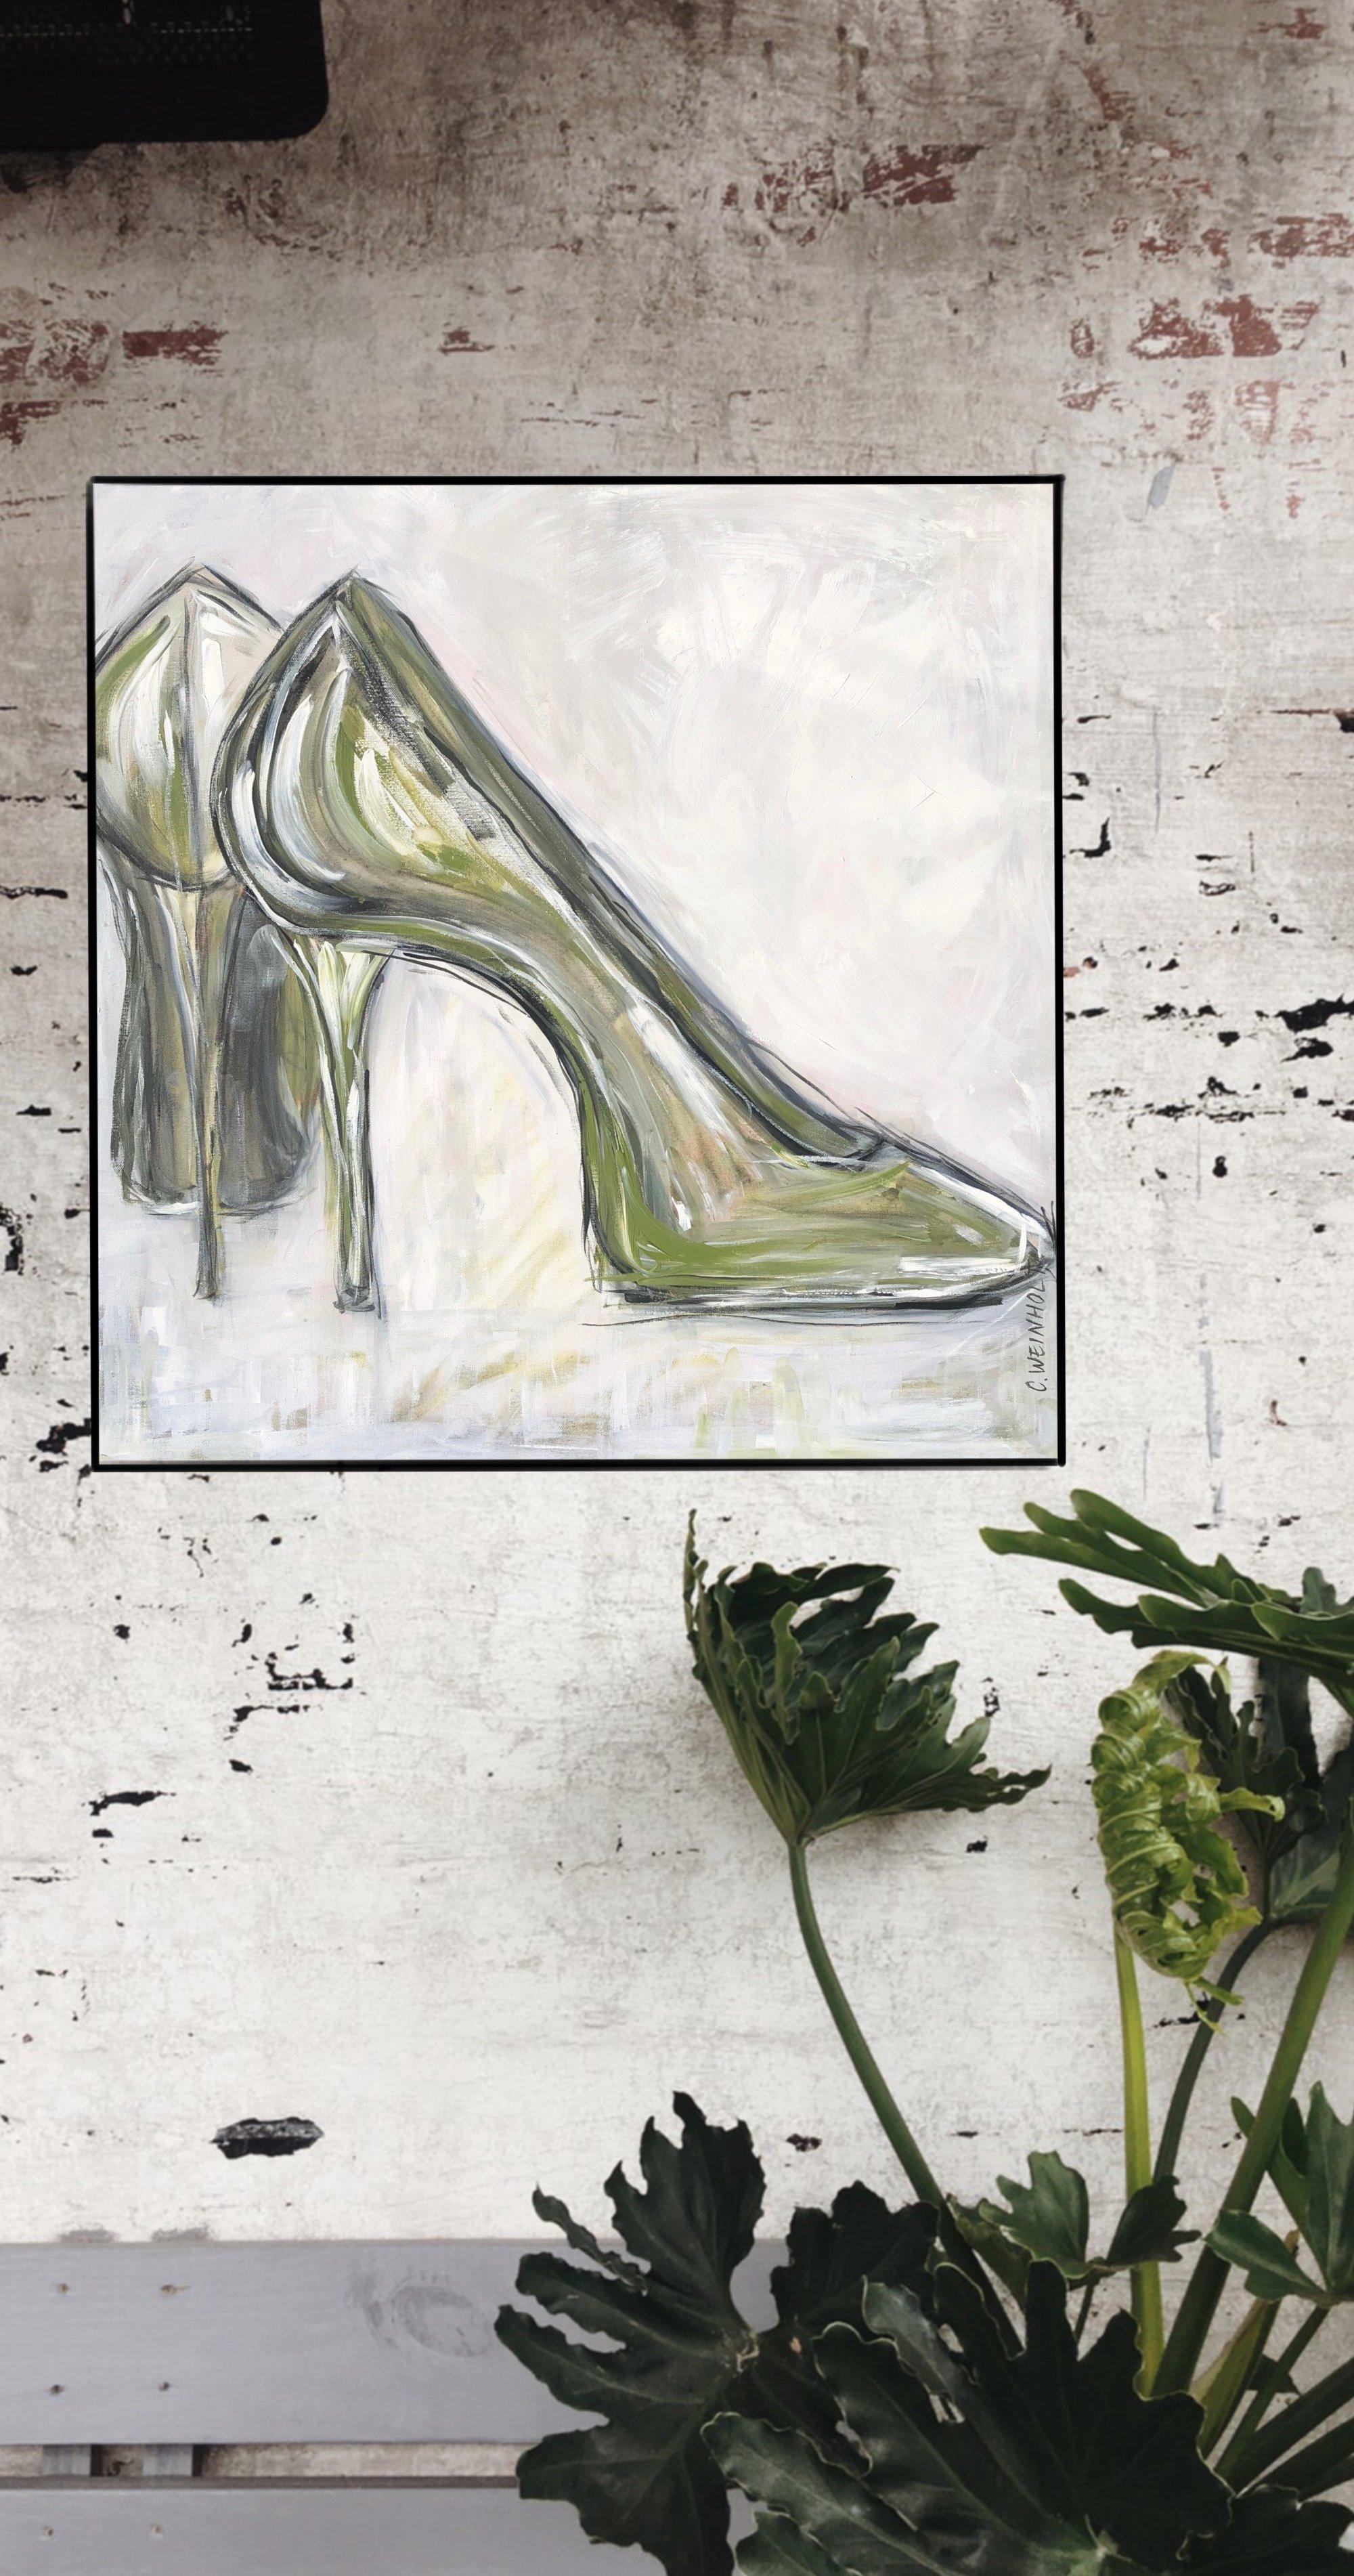 Gröna skor